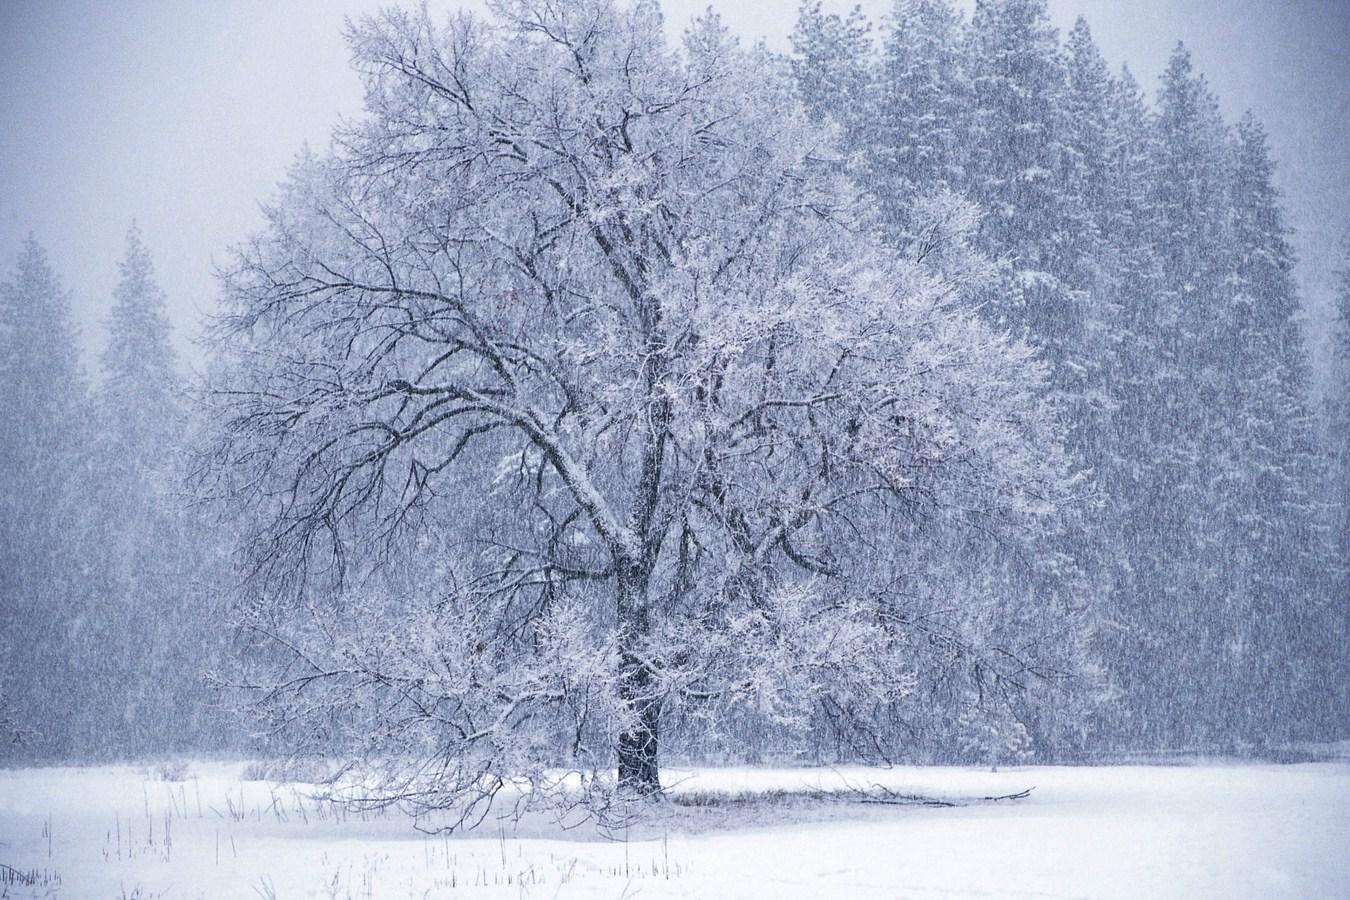 snowing desktop background